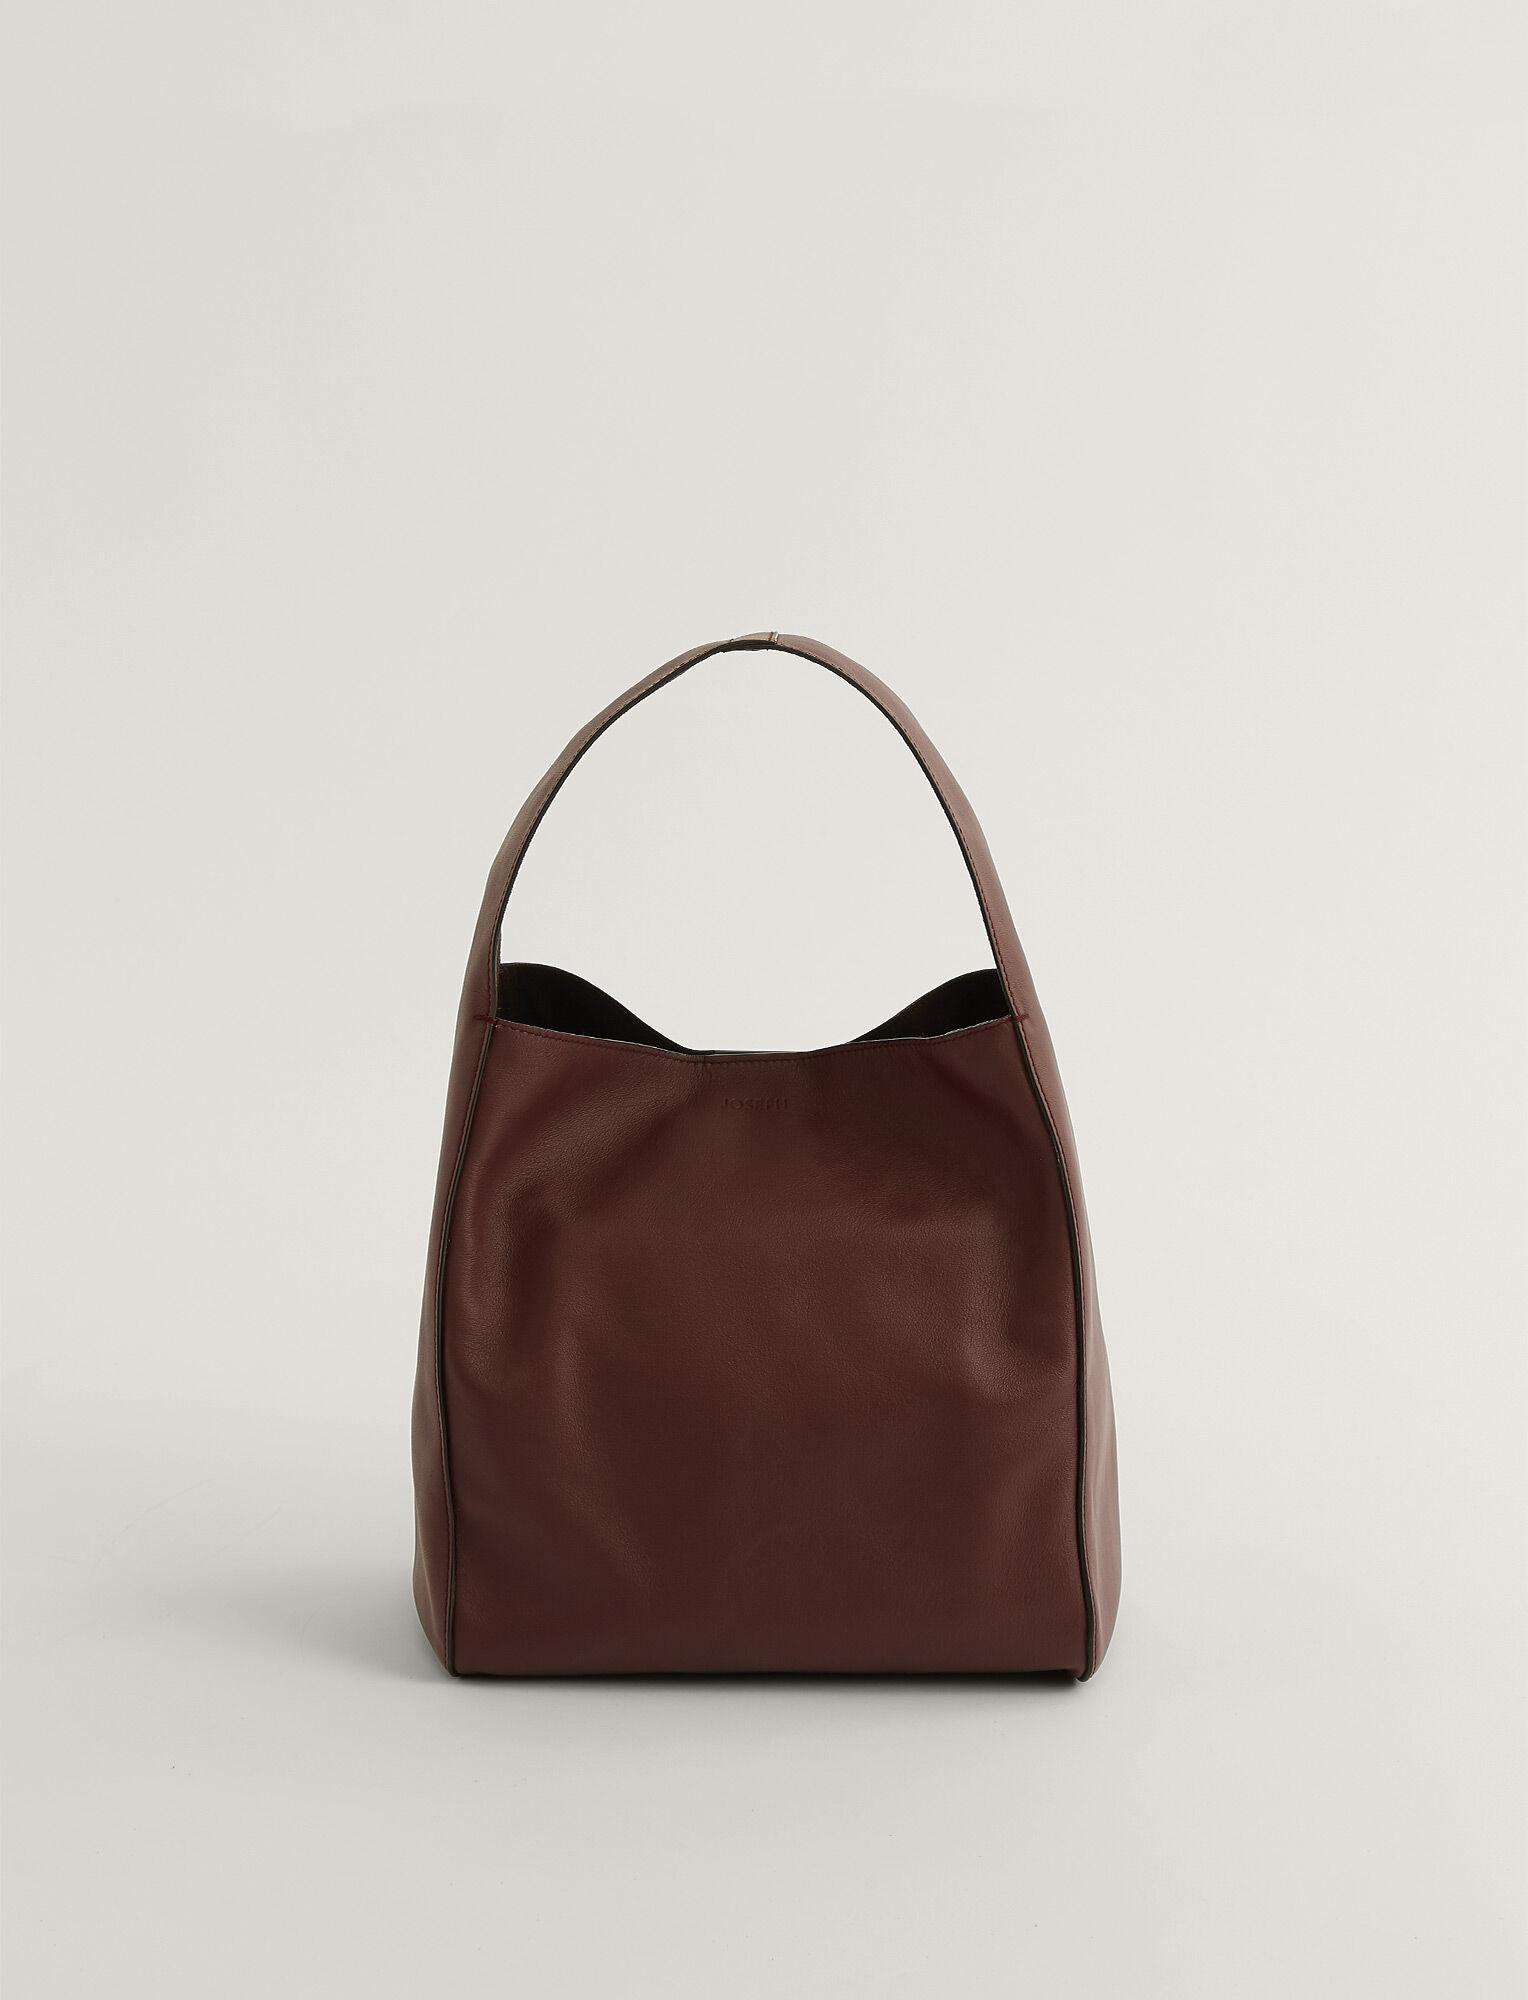 Joseph, Slouch S Bag, in Ganache